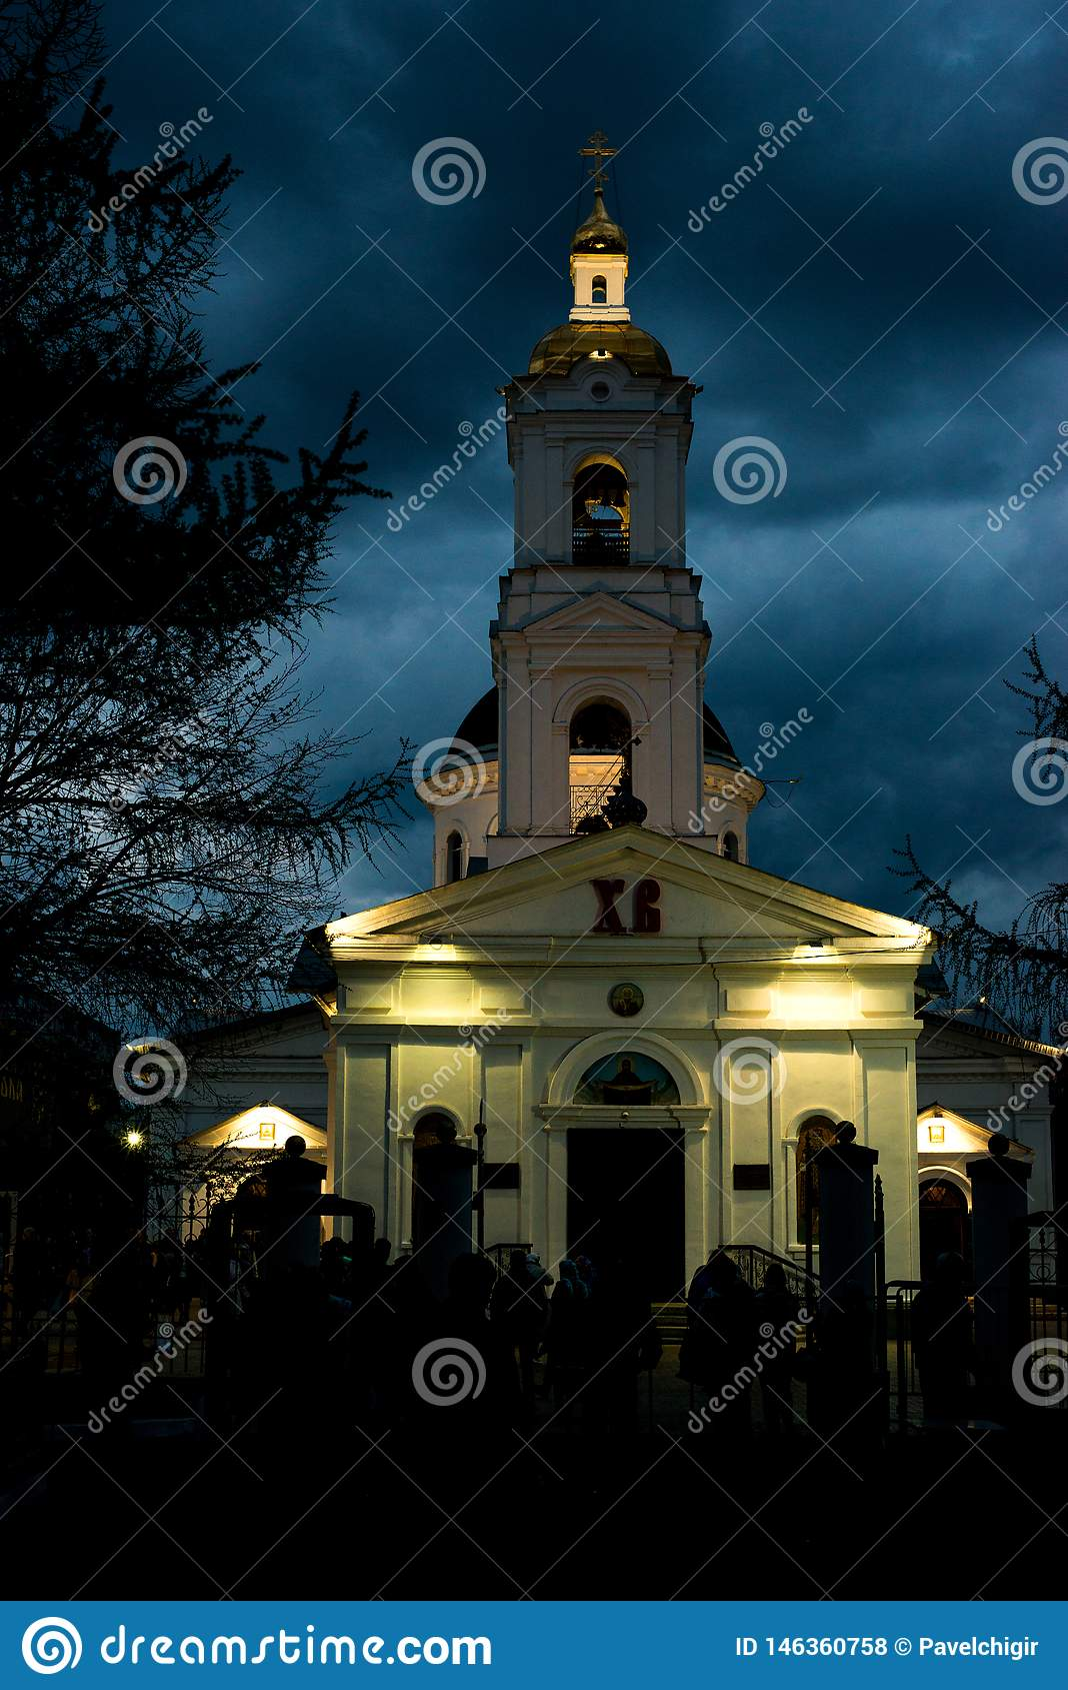 T?ckning av den ortodoxa kyrkan p? den mest sakrala ferie-p?sken